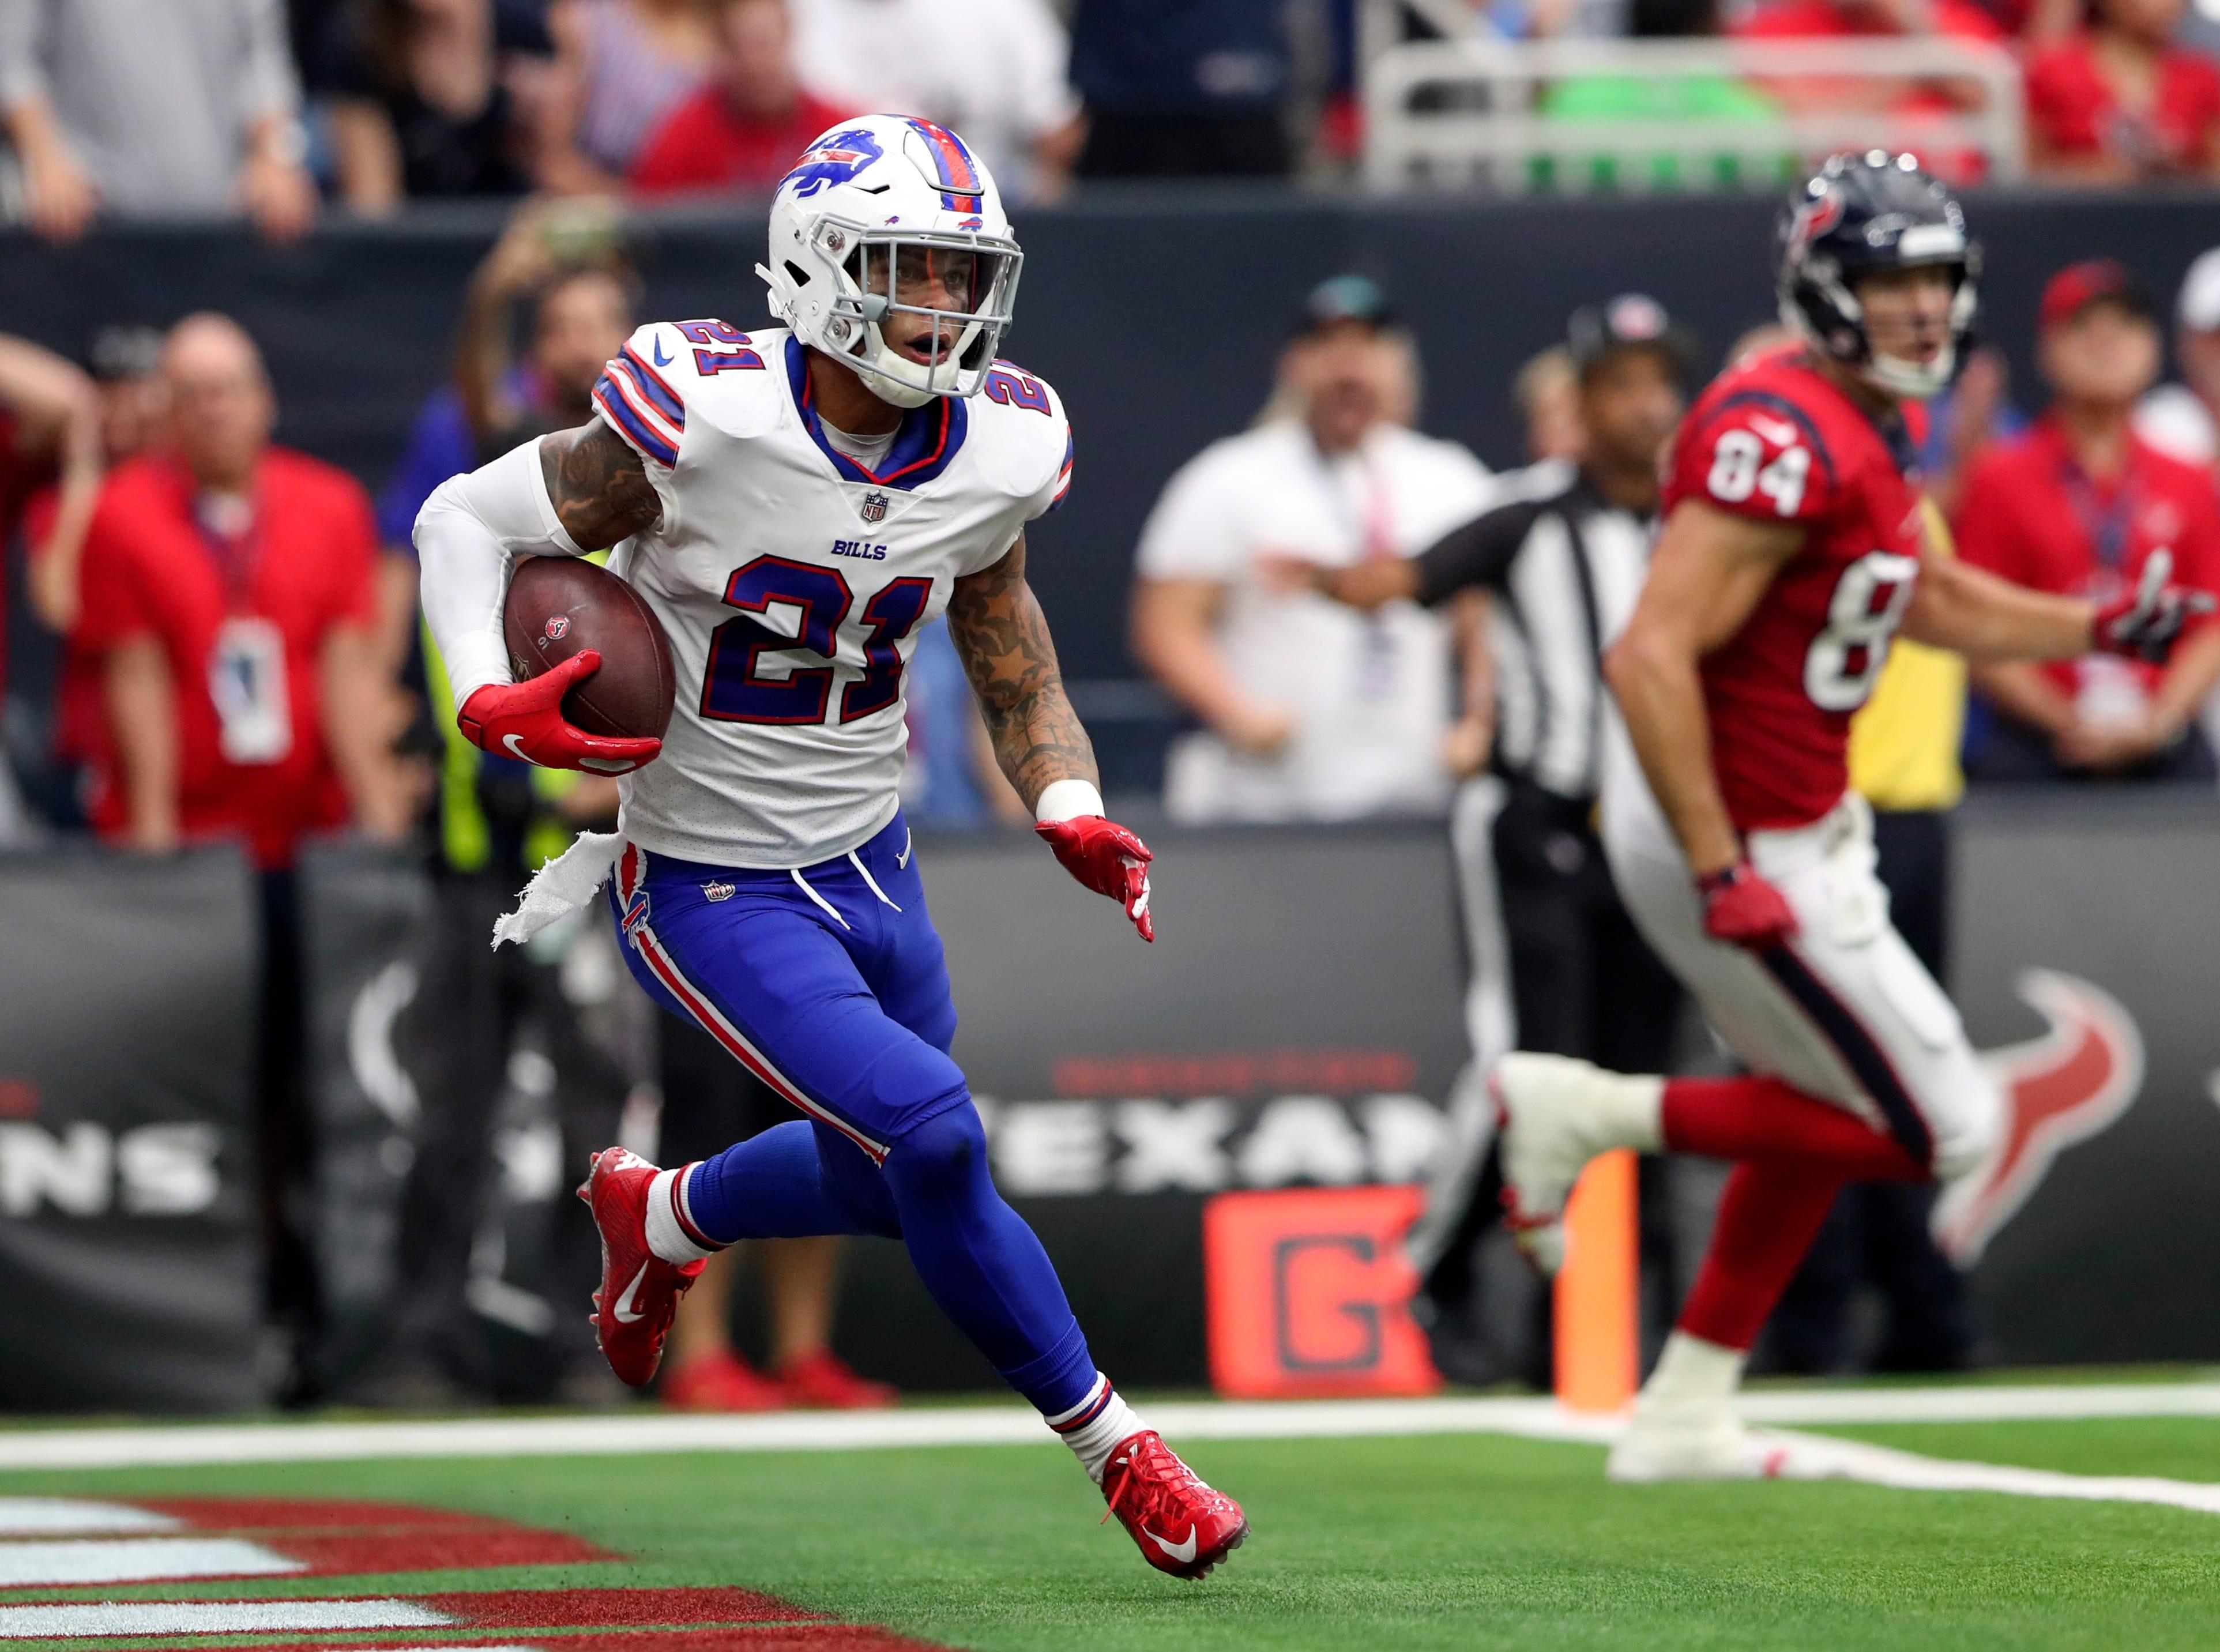 Oct 14, 2018; Houston, TX, USA; Buffalo Bills free safety Jordan Poyer (21) intercepts a ball during the second quarter against the Houston Texans at NRG Stadium. Mandatory Credit: Kevin Jairaj-USA TODAY Sports